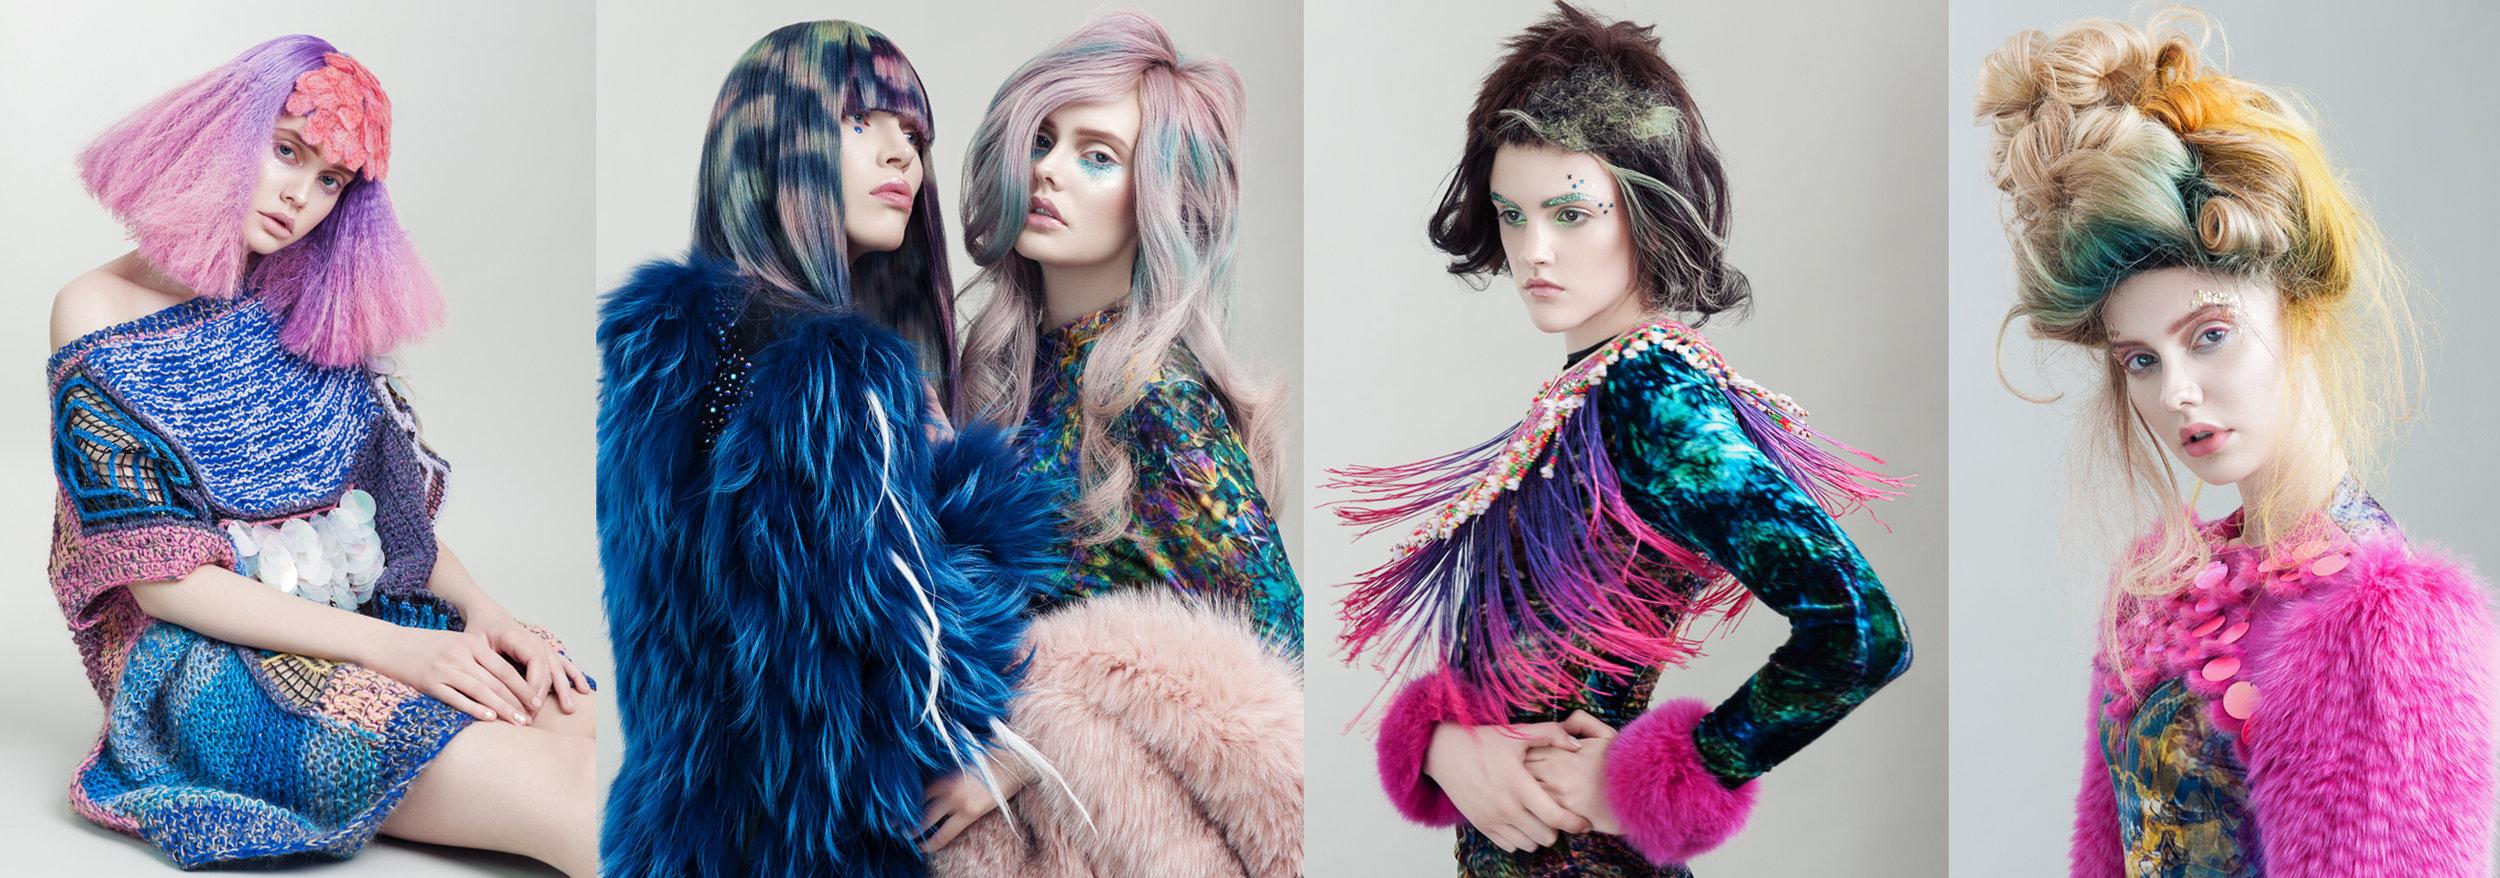 updo avant garde künstler hairinspiration mermaid hair unicorn hair pulp riot olaplex friseur wien danny lizzy gingerlemon dvt handcrafted hair fotograf bunte haare.jpg